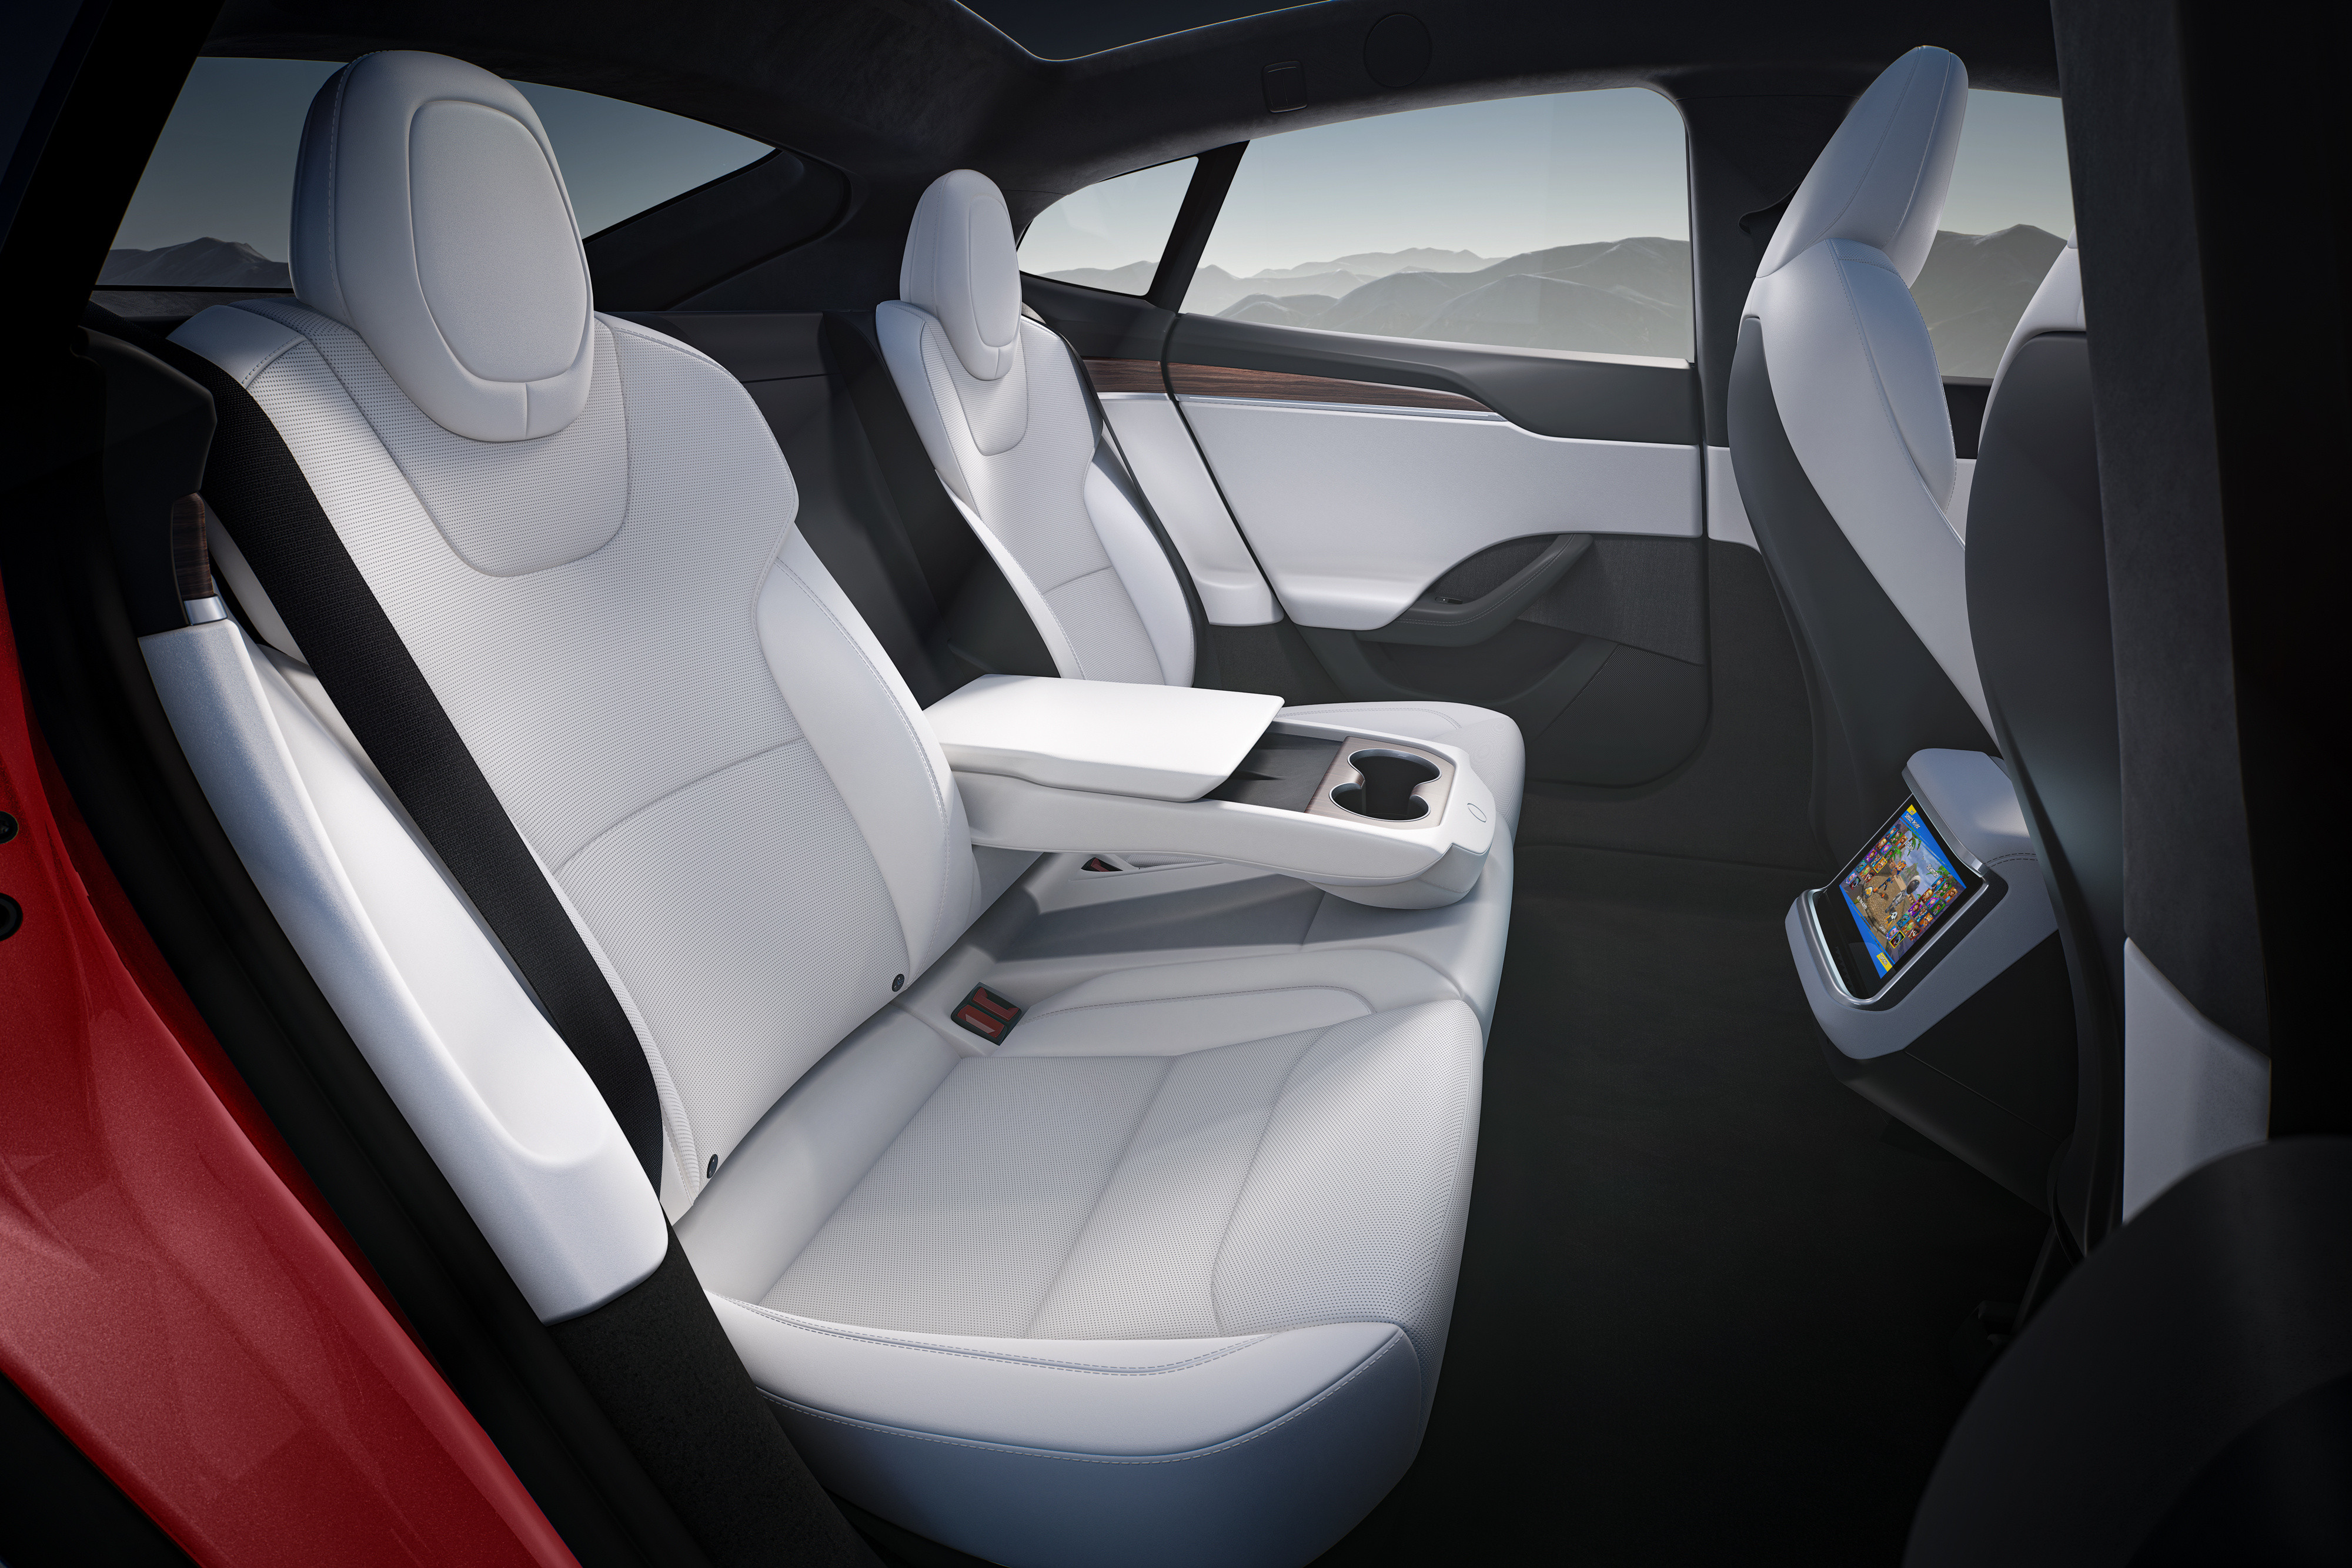 Backseat of Tesla Model S